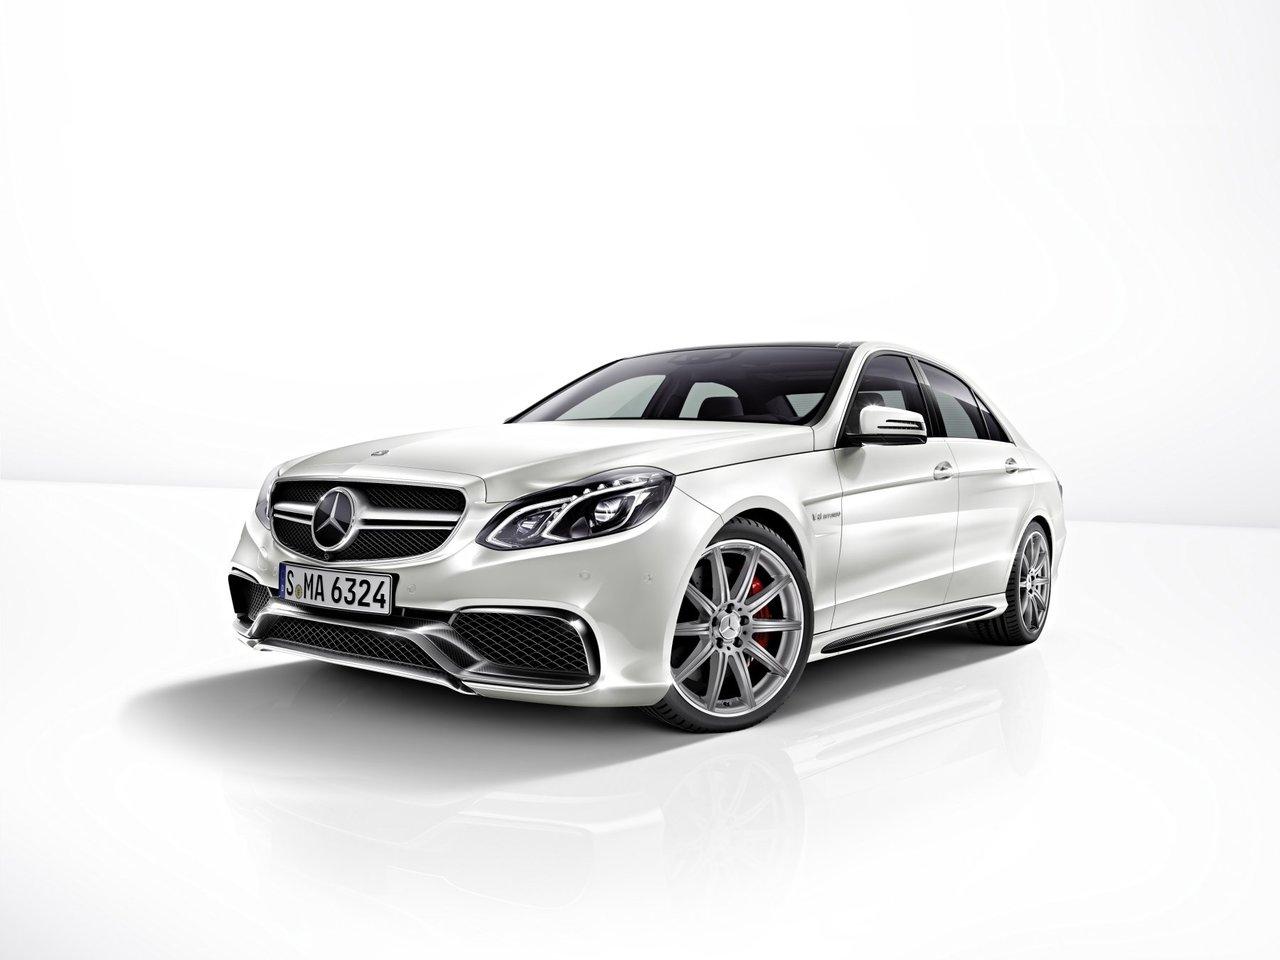 Снимки: Mercedes-benz E-klasse (W212) Facelift